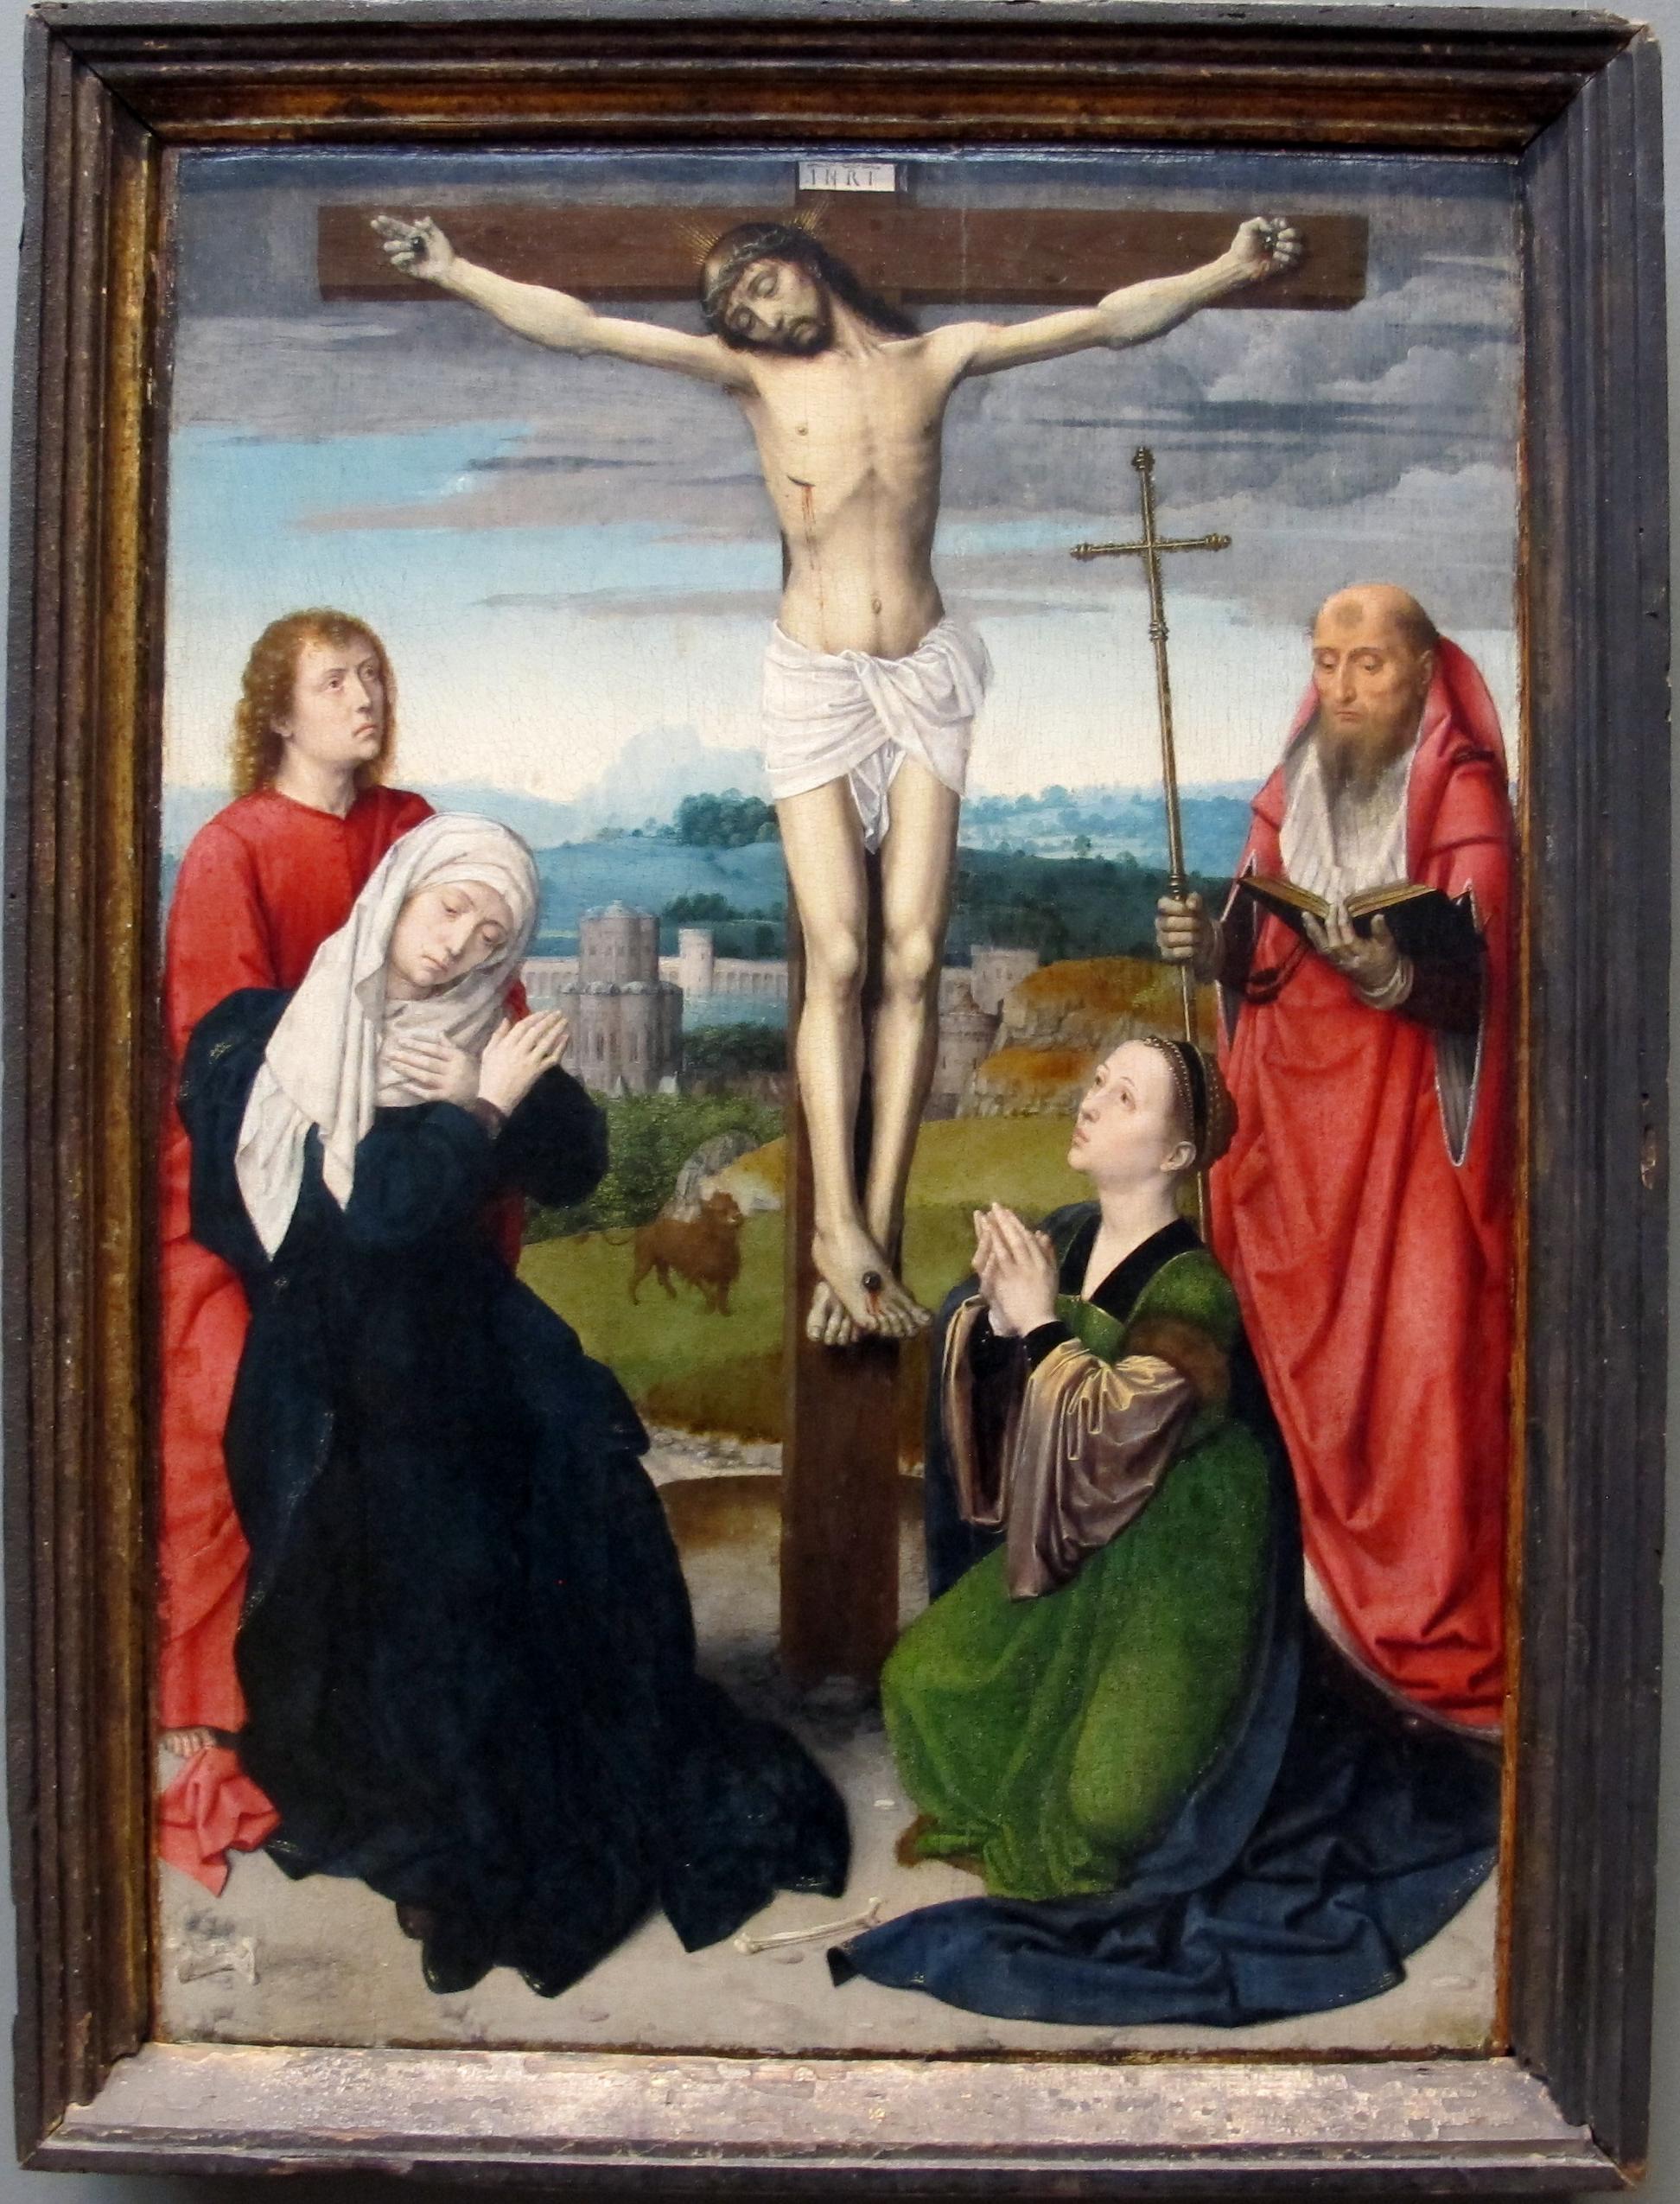 Gerard_david,_crocifissione, 1495_ca MET